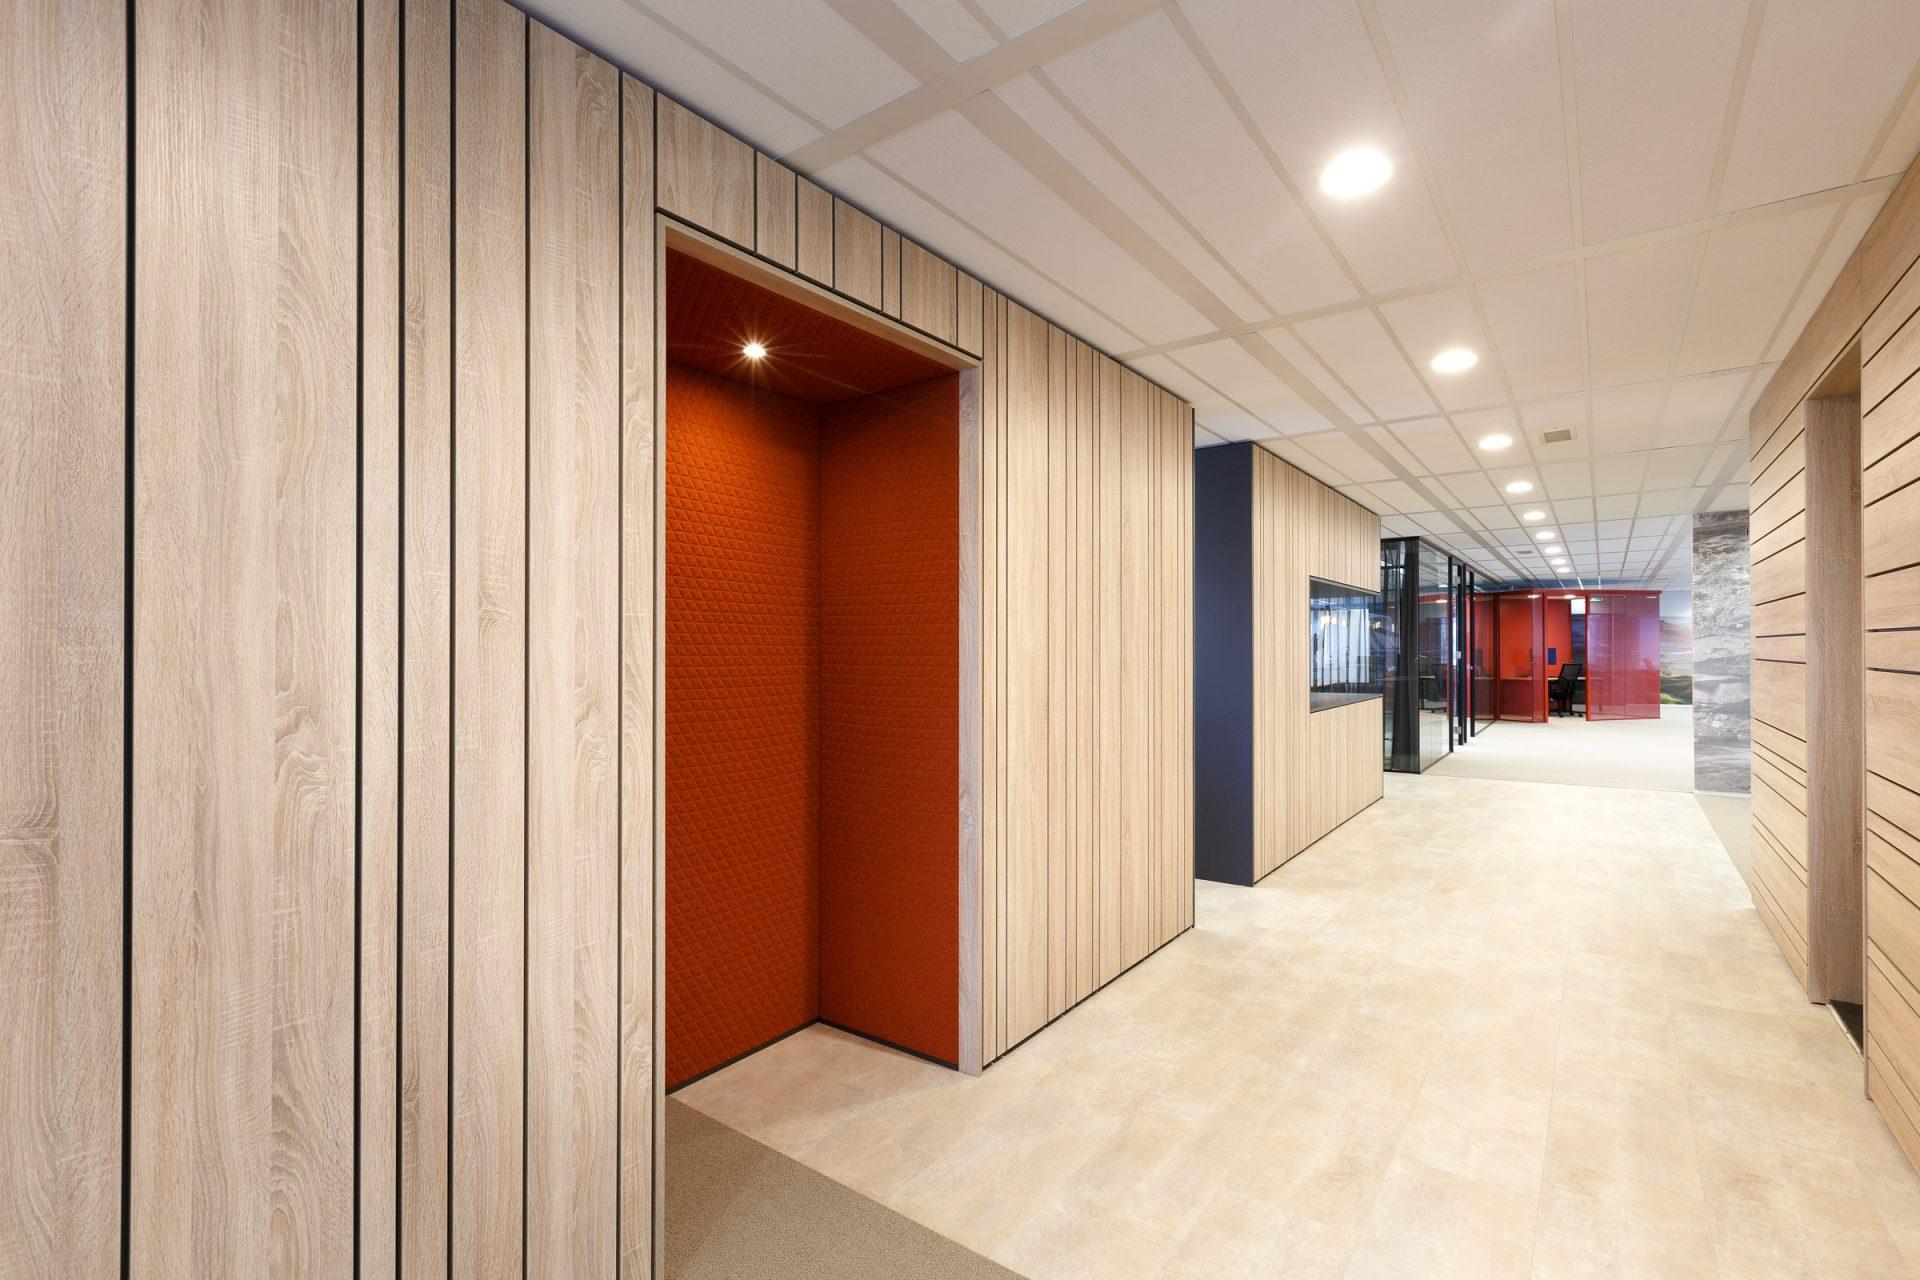 RubiX s-Hertogenbosch - Topperprojecten 10